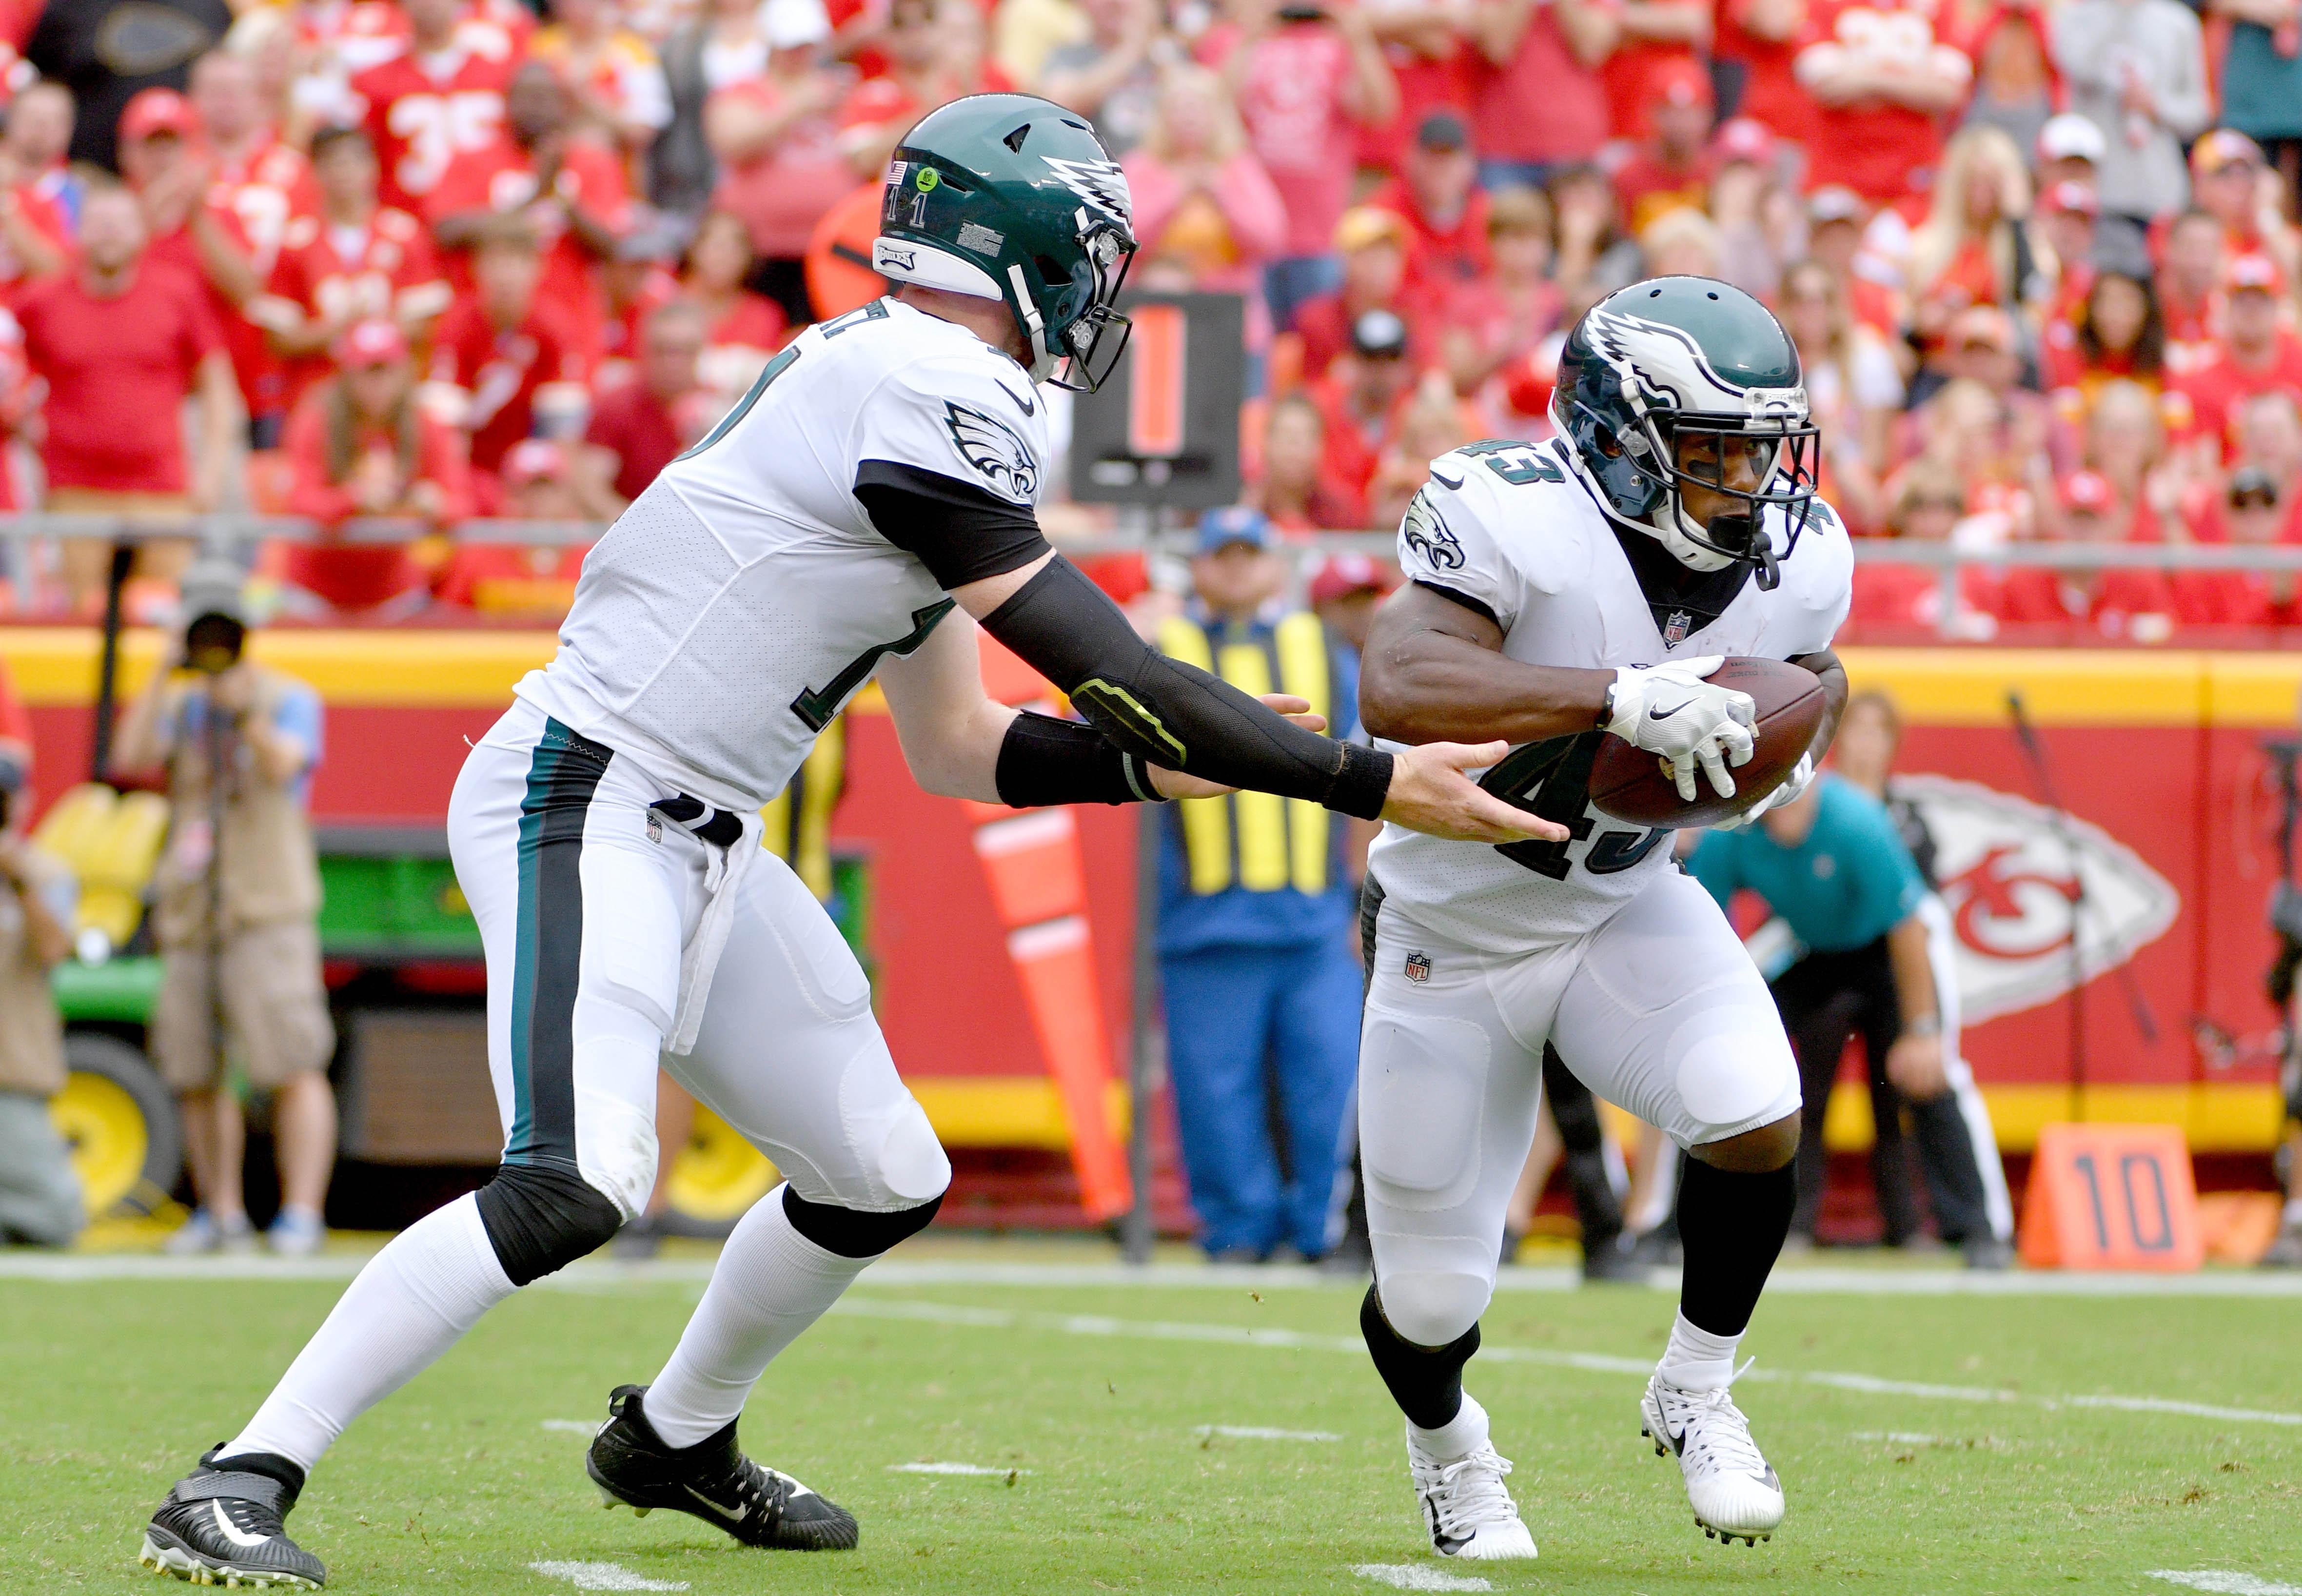 Report: Darren Sproles leaning toward returning next season